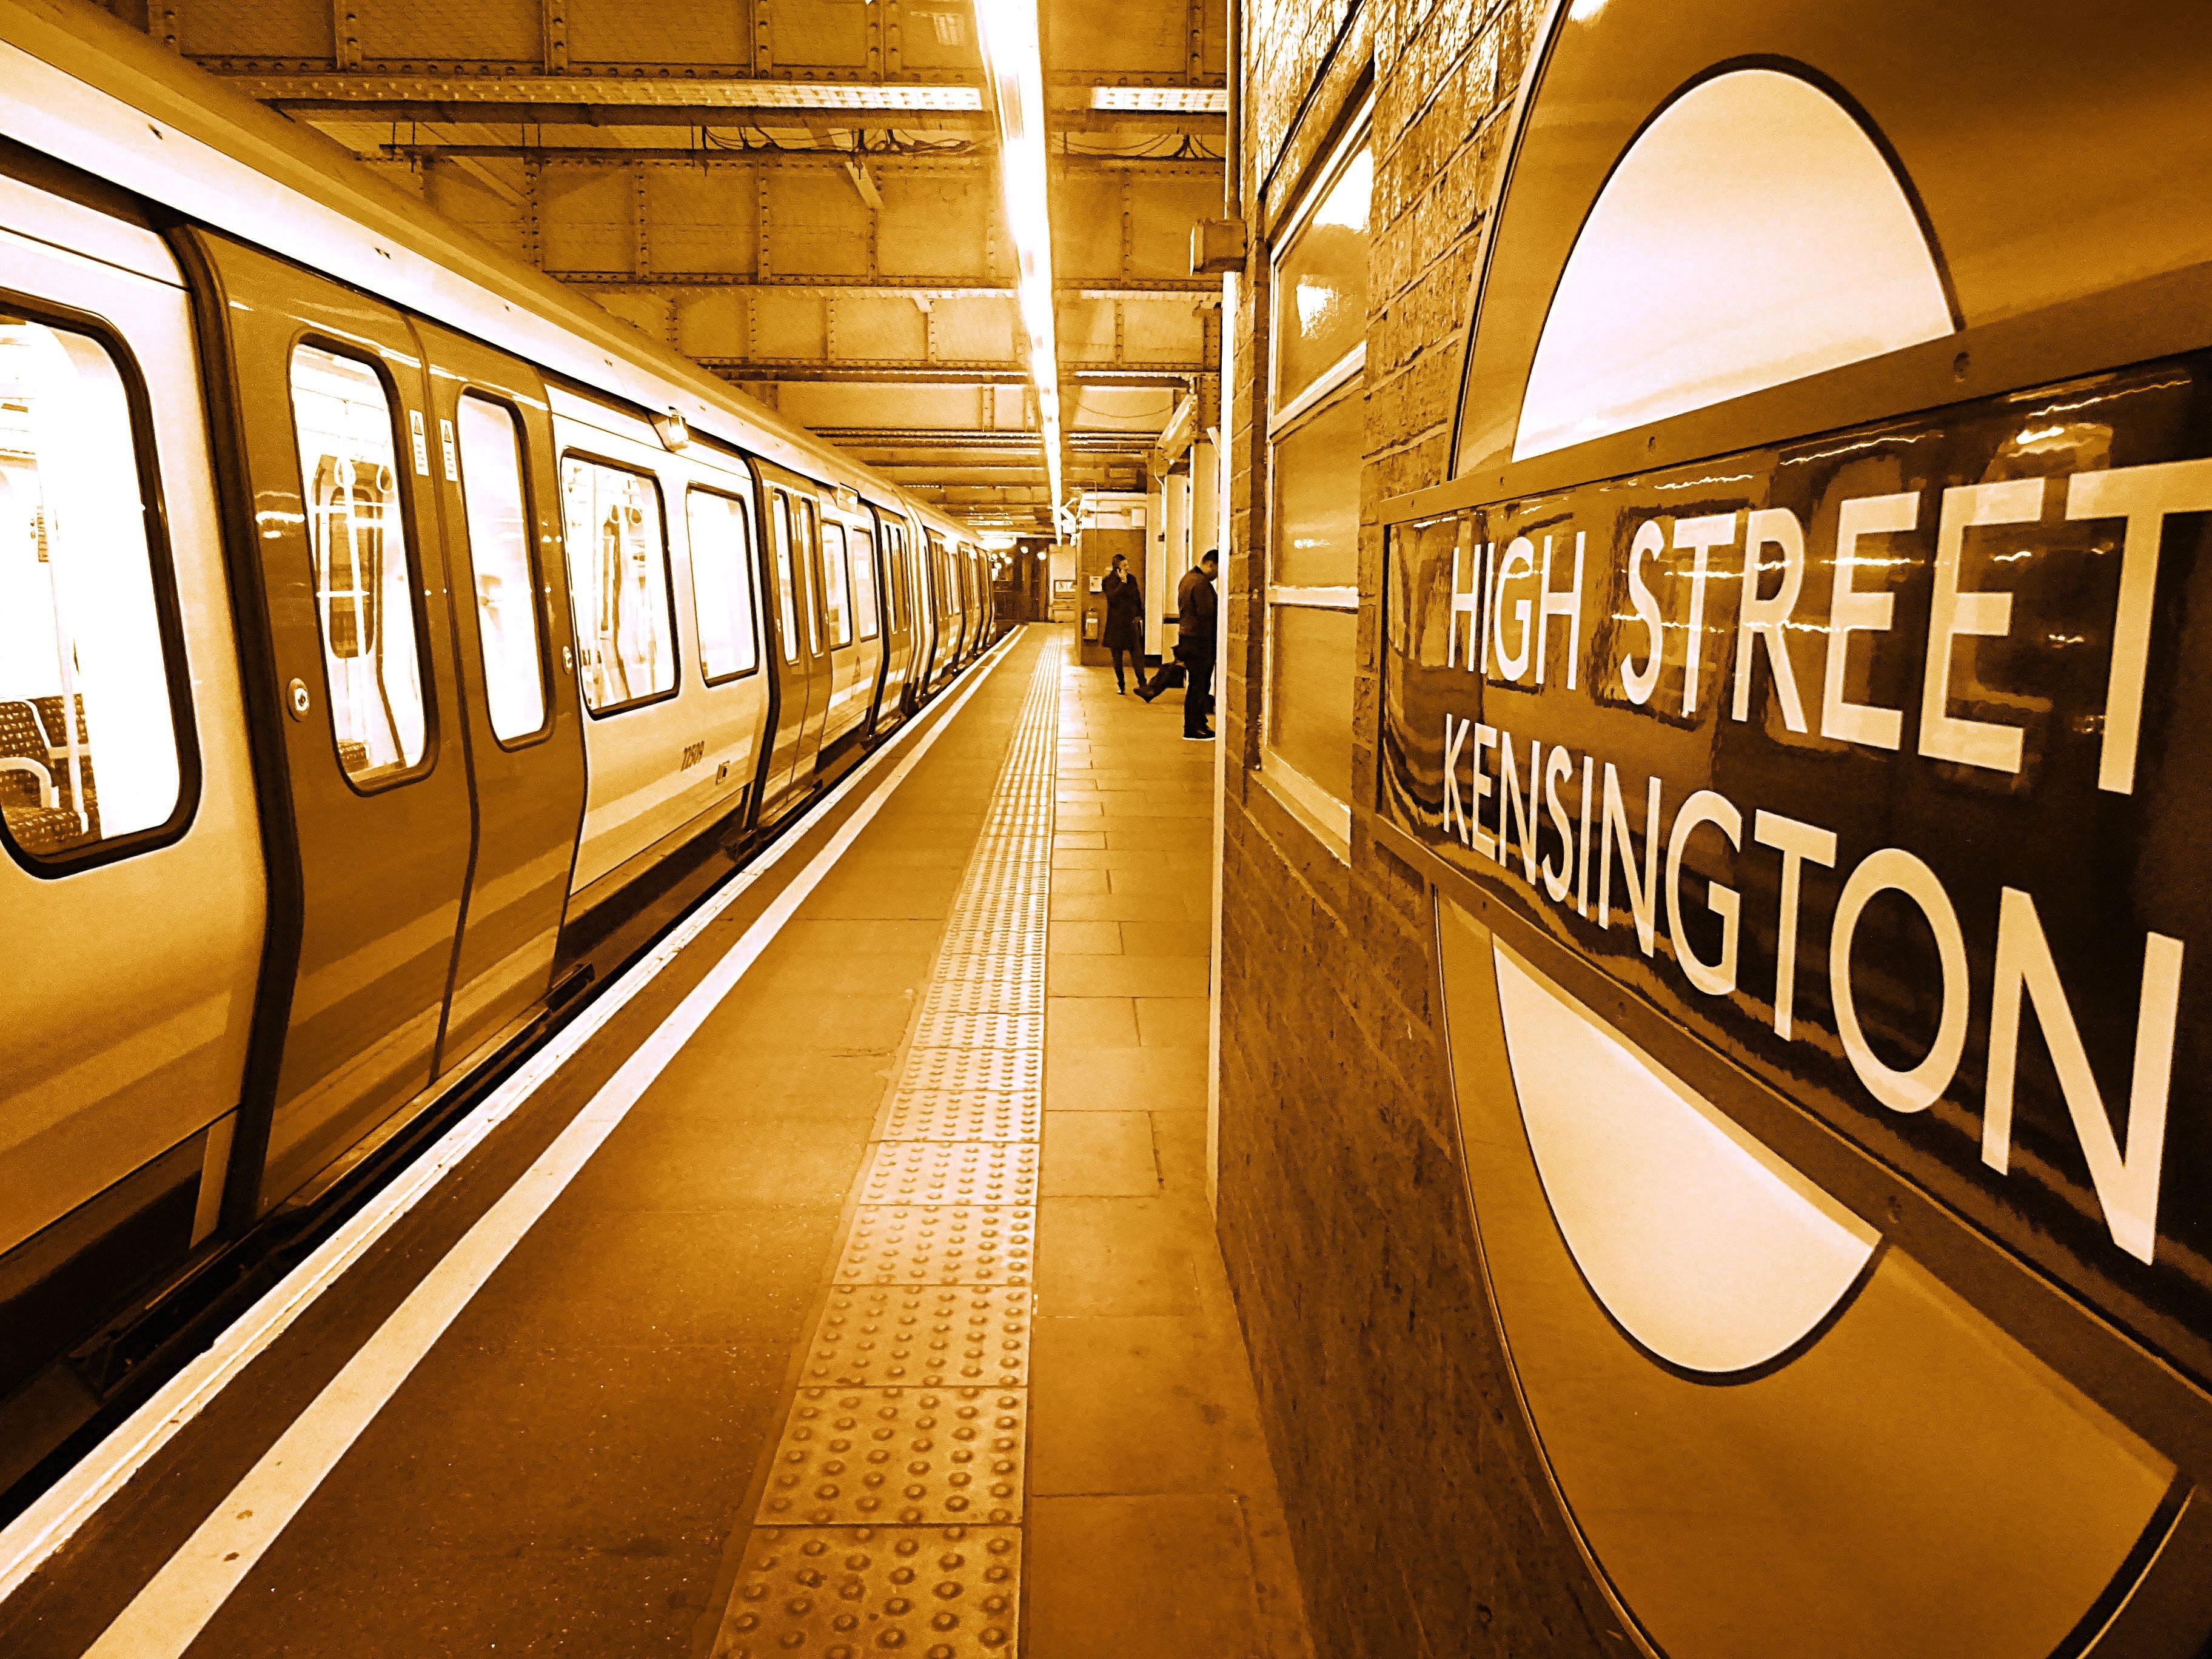 High Street Kensington Hallway